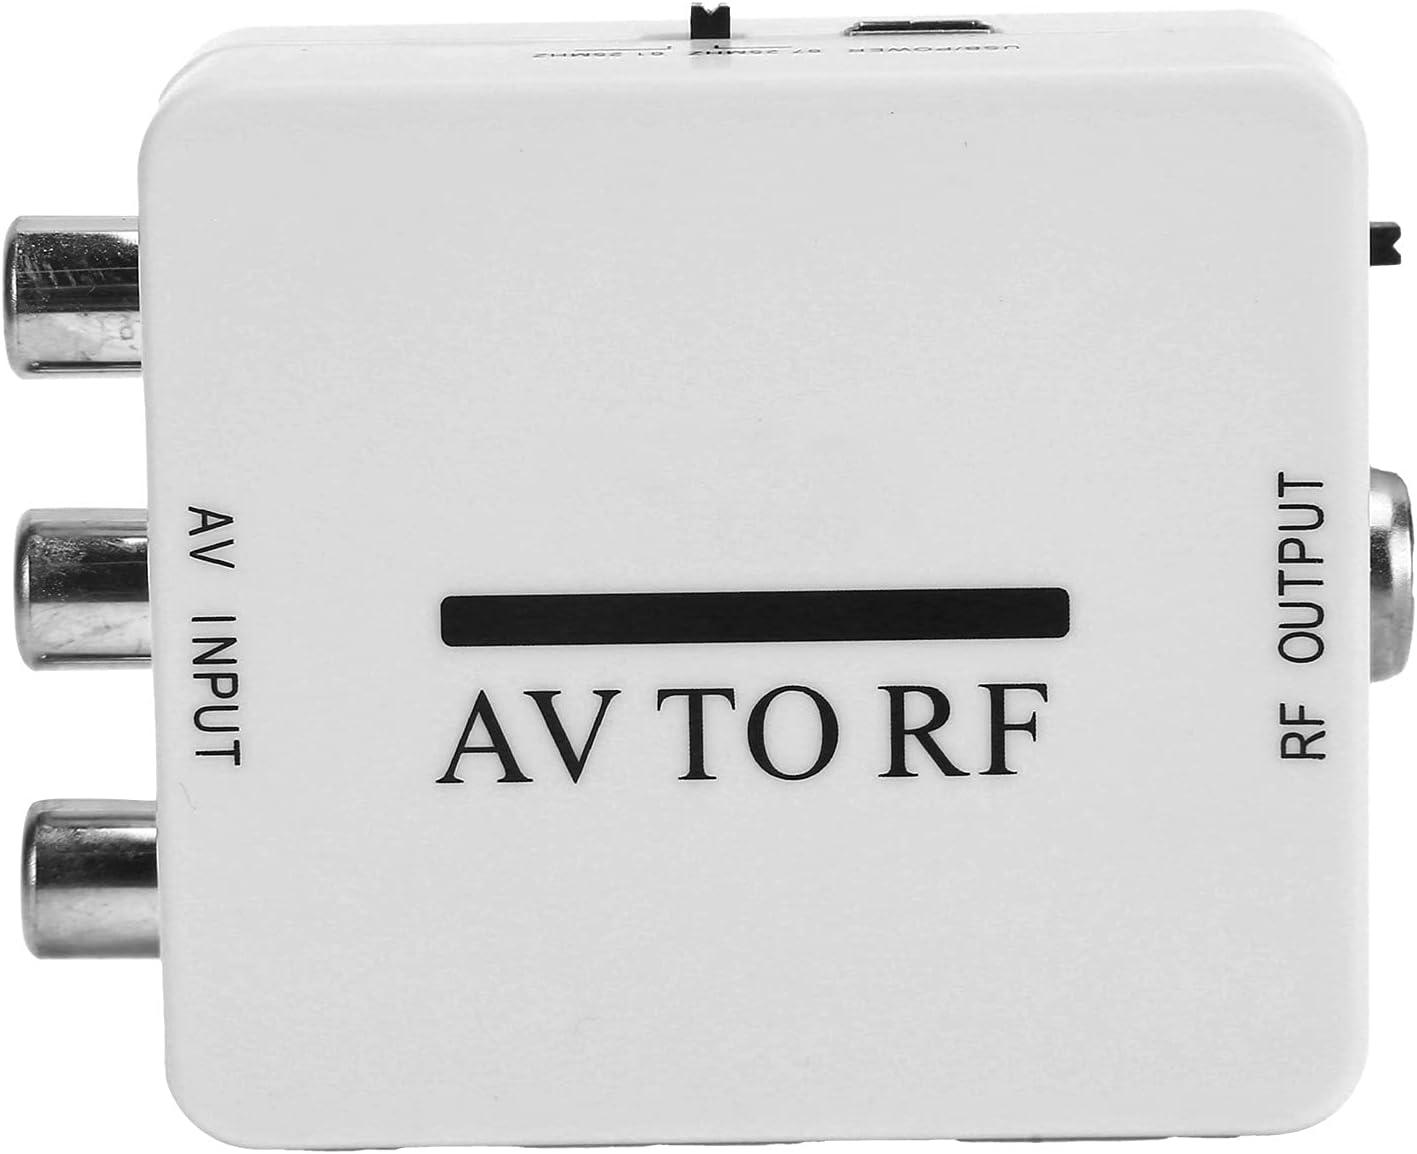 Video Converter Mini Gorgeous Audio Adapter Dallas Mall TV 67 CVSB AV to RF Amplifier